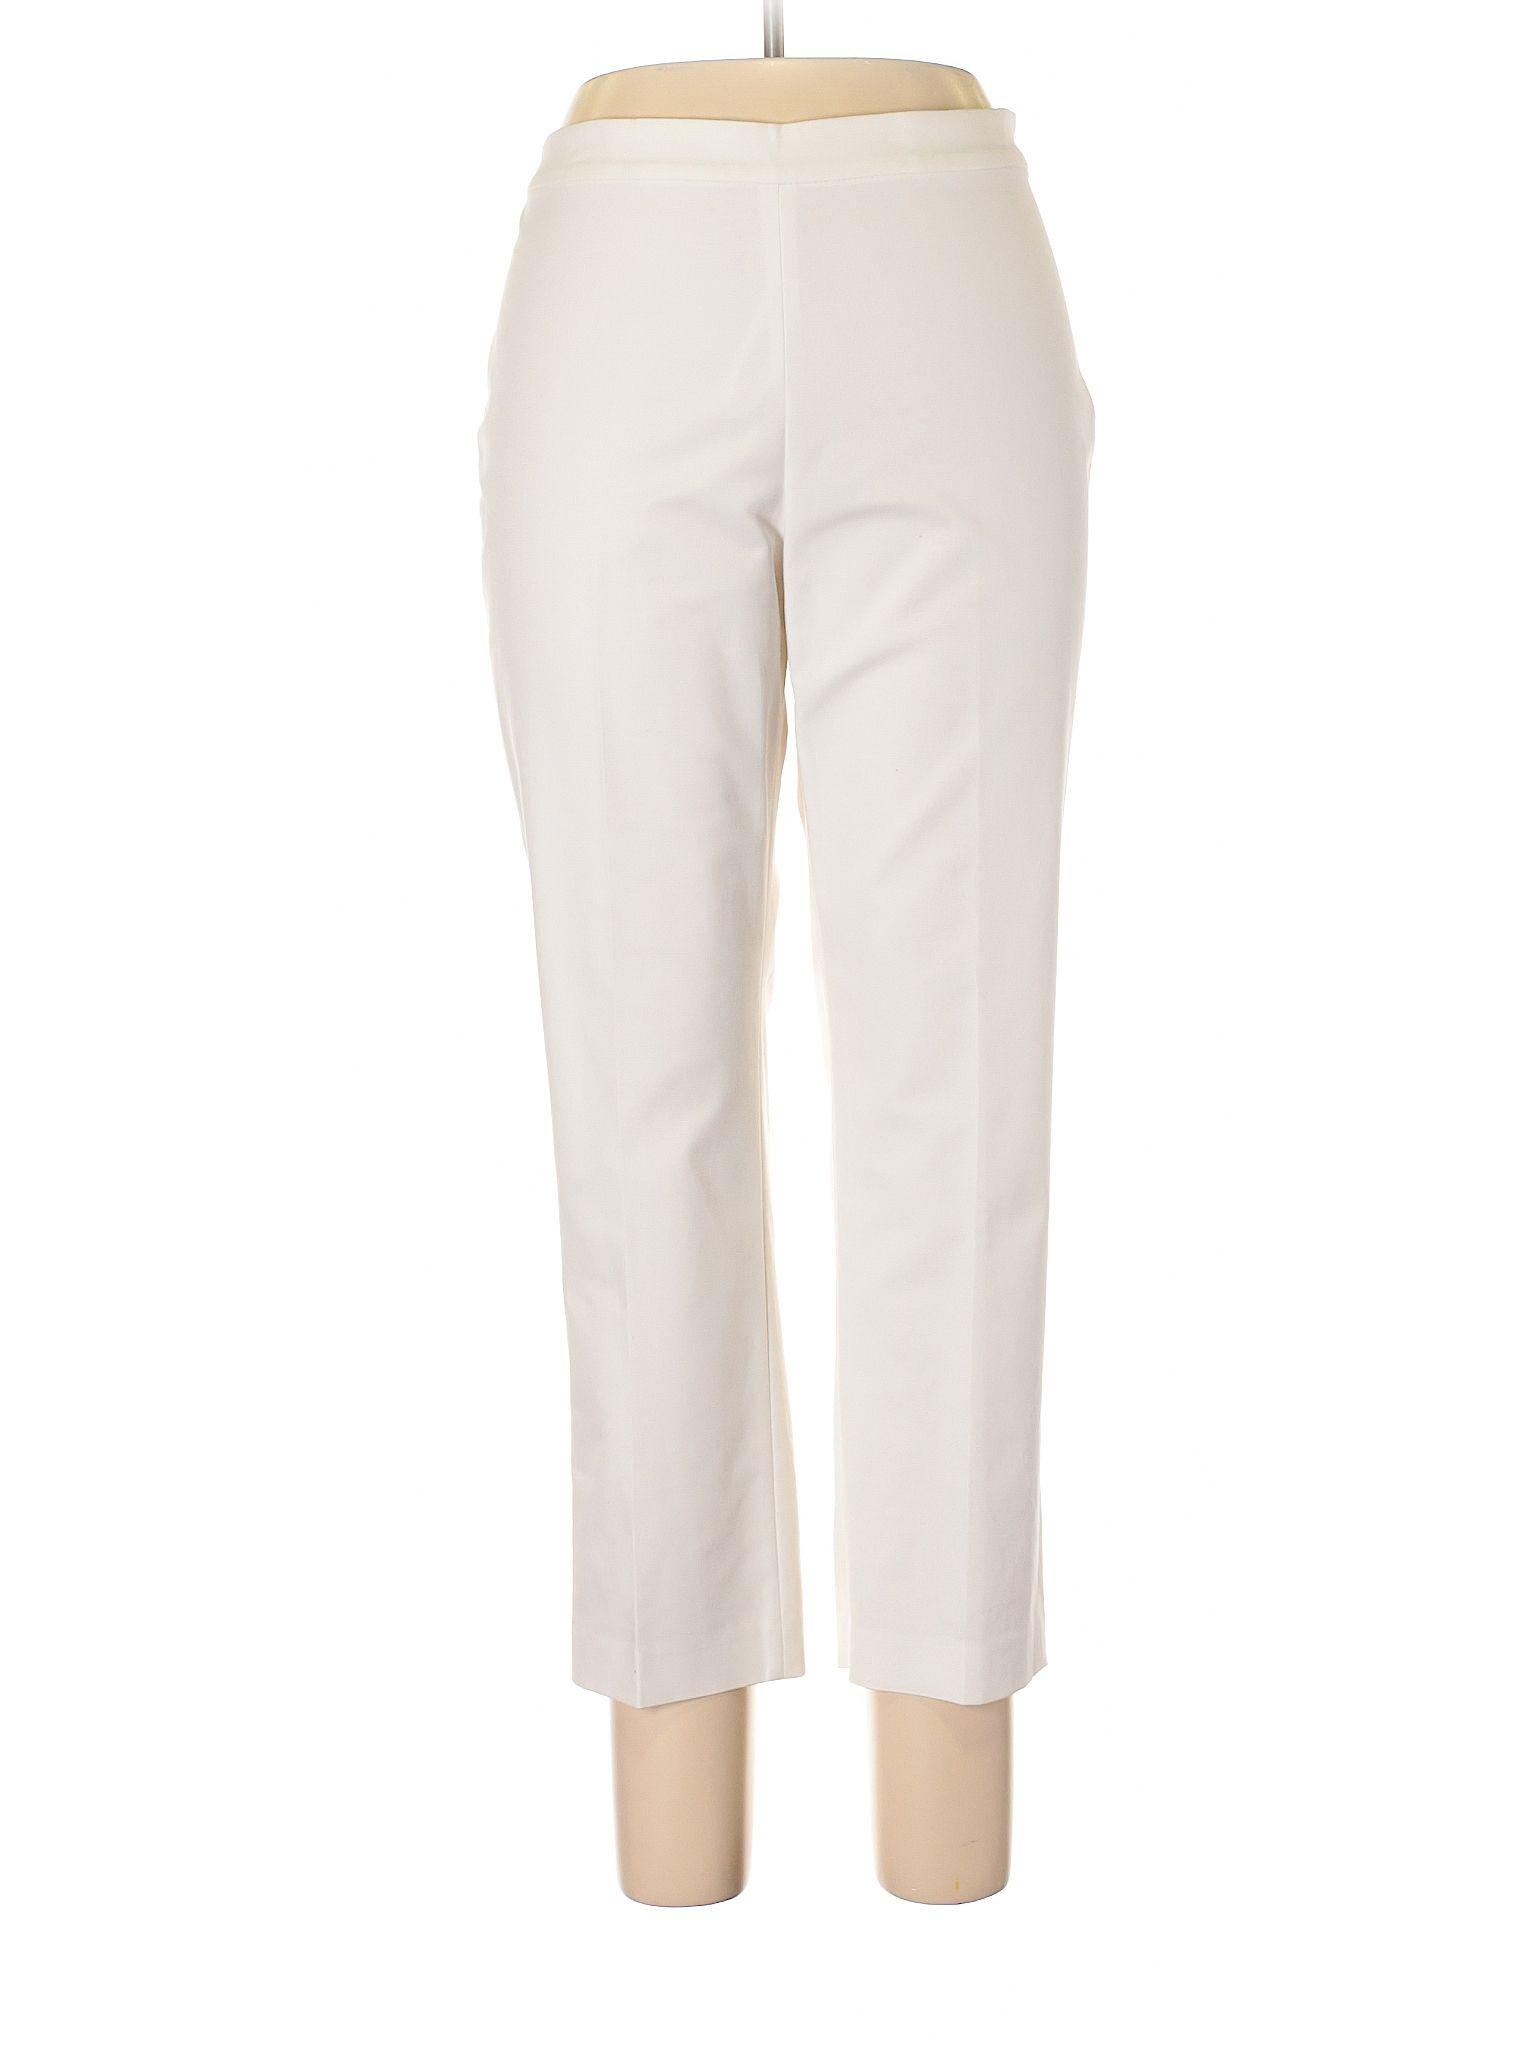 Dress pants dress pants white dress pants pants